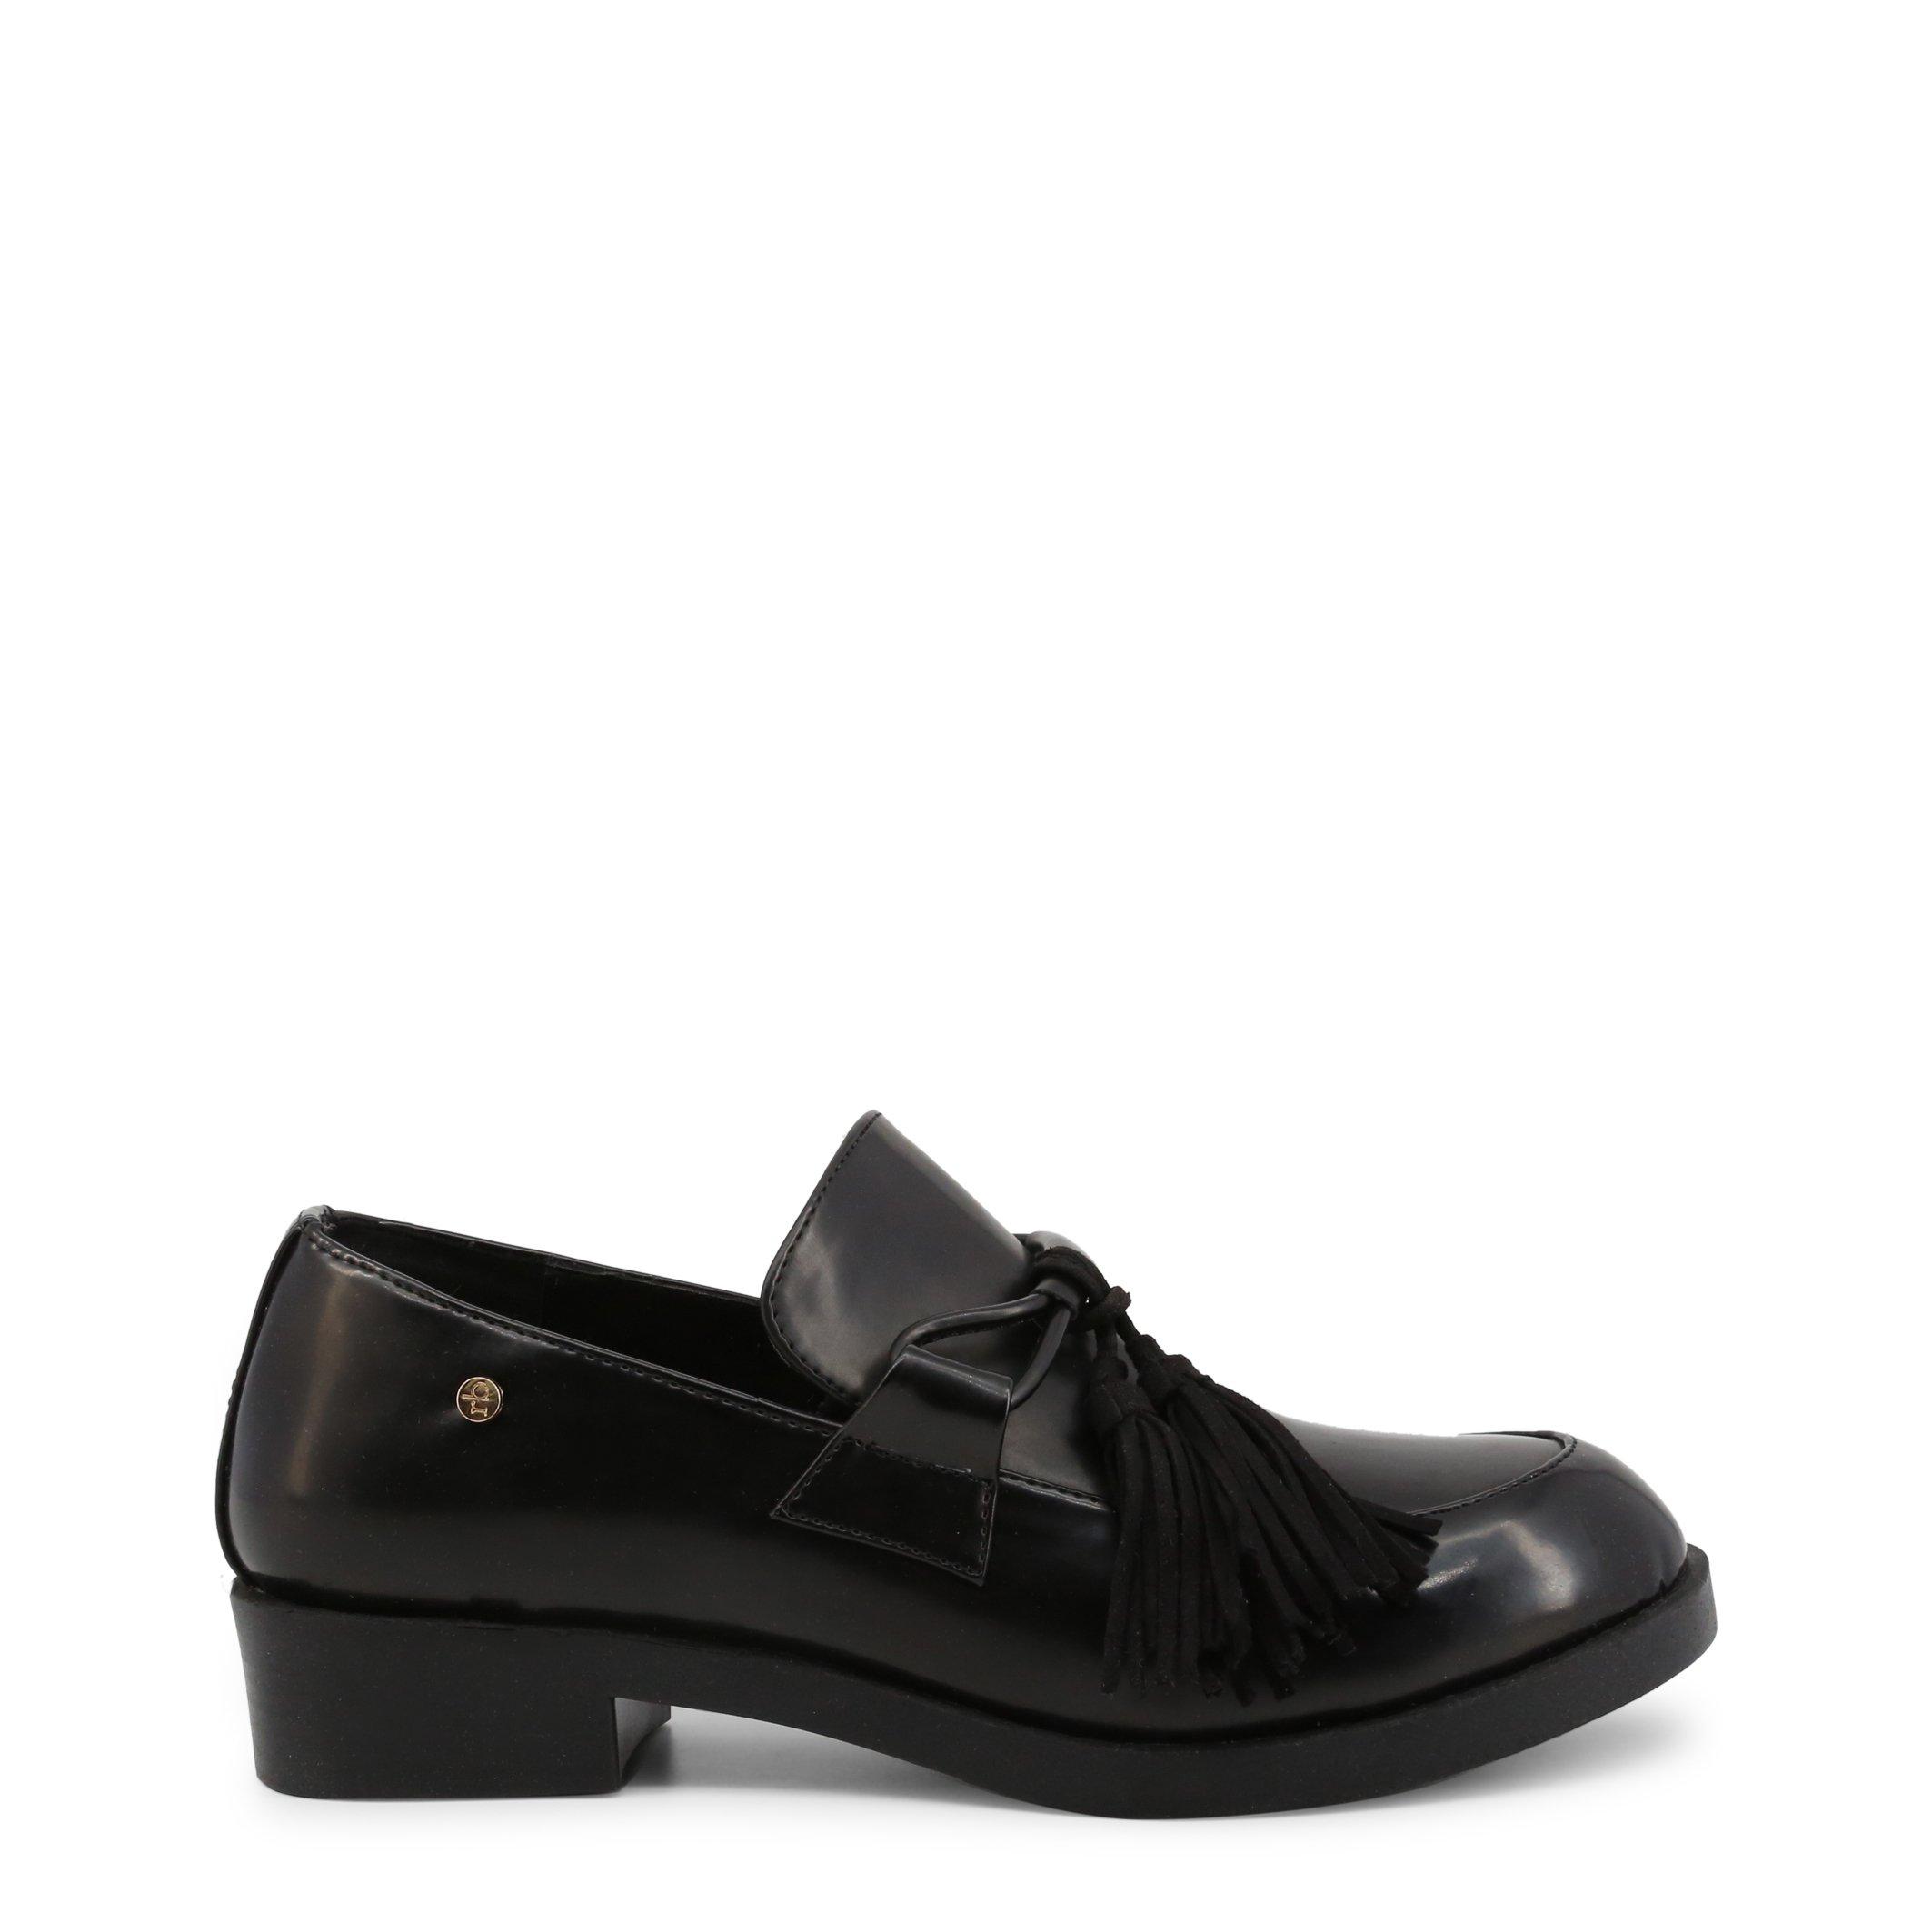 Roccobarocco Women's Loafer Various Colours RBSC1JS03 - black EU 35